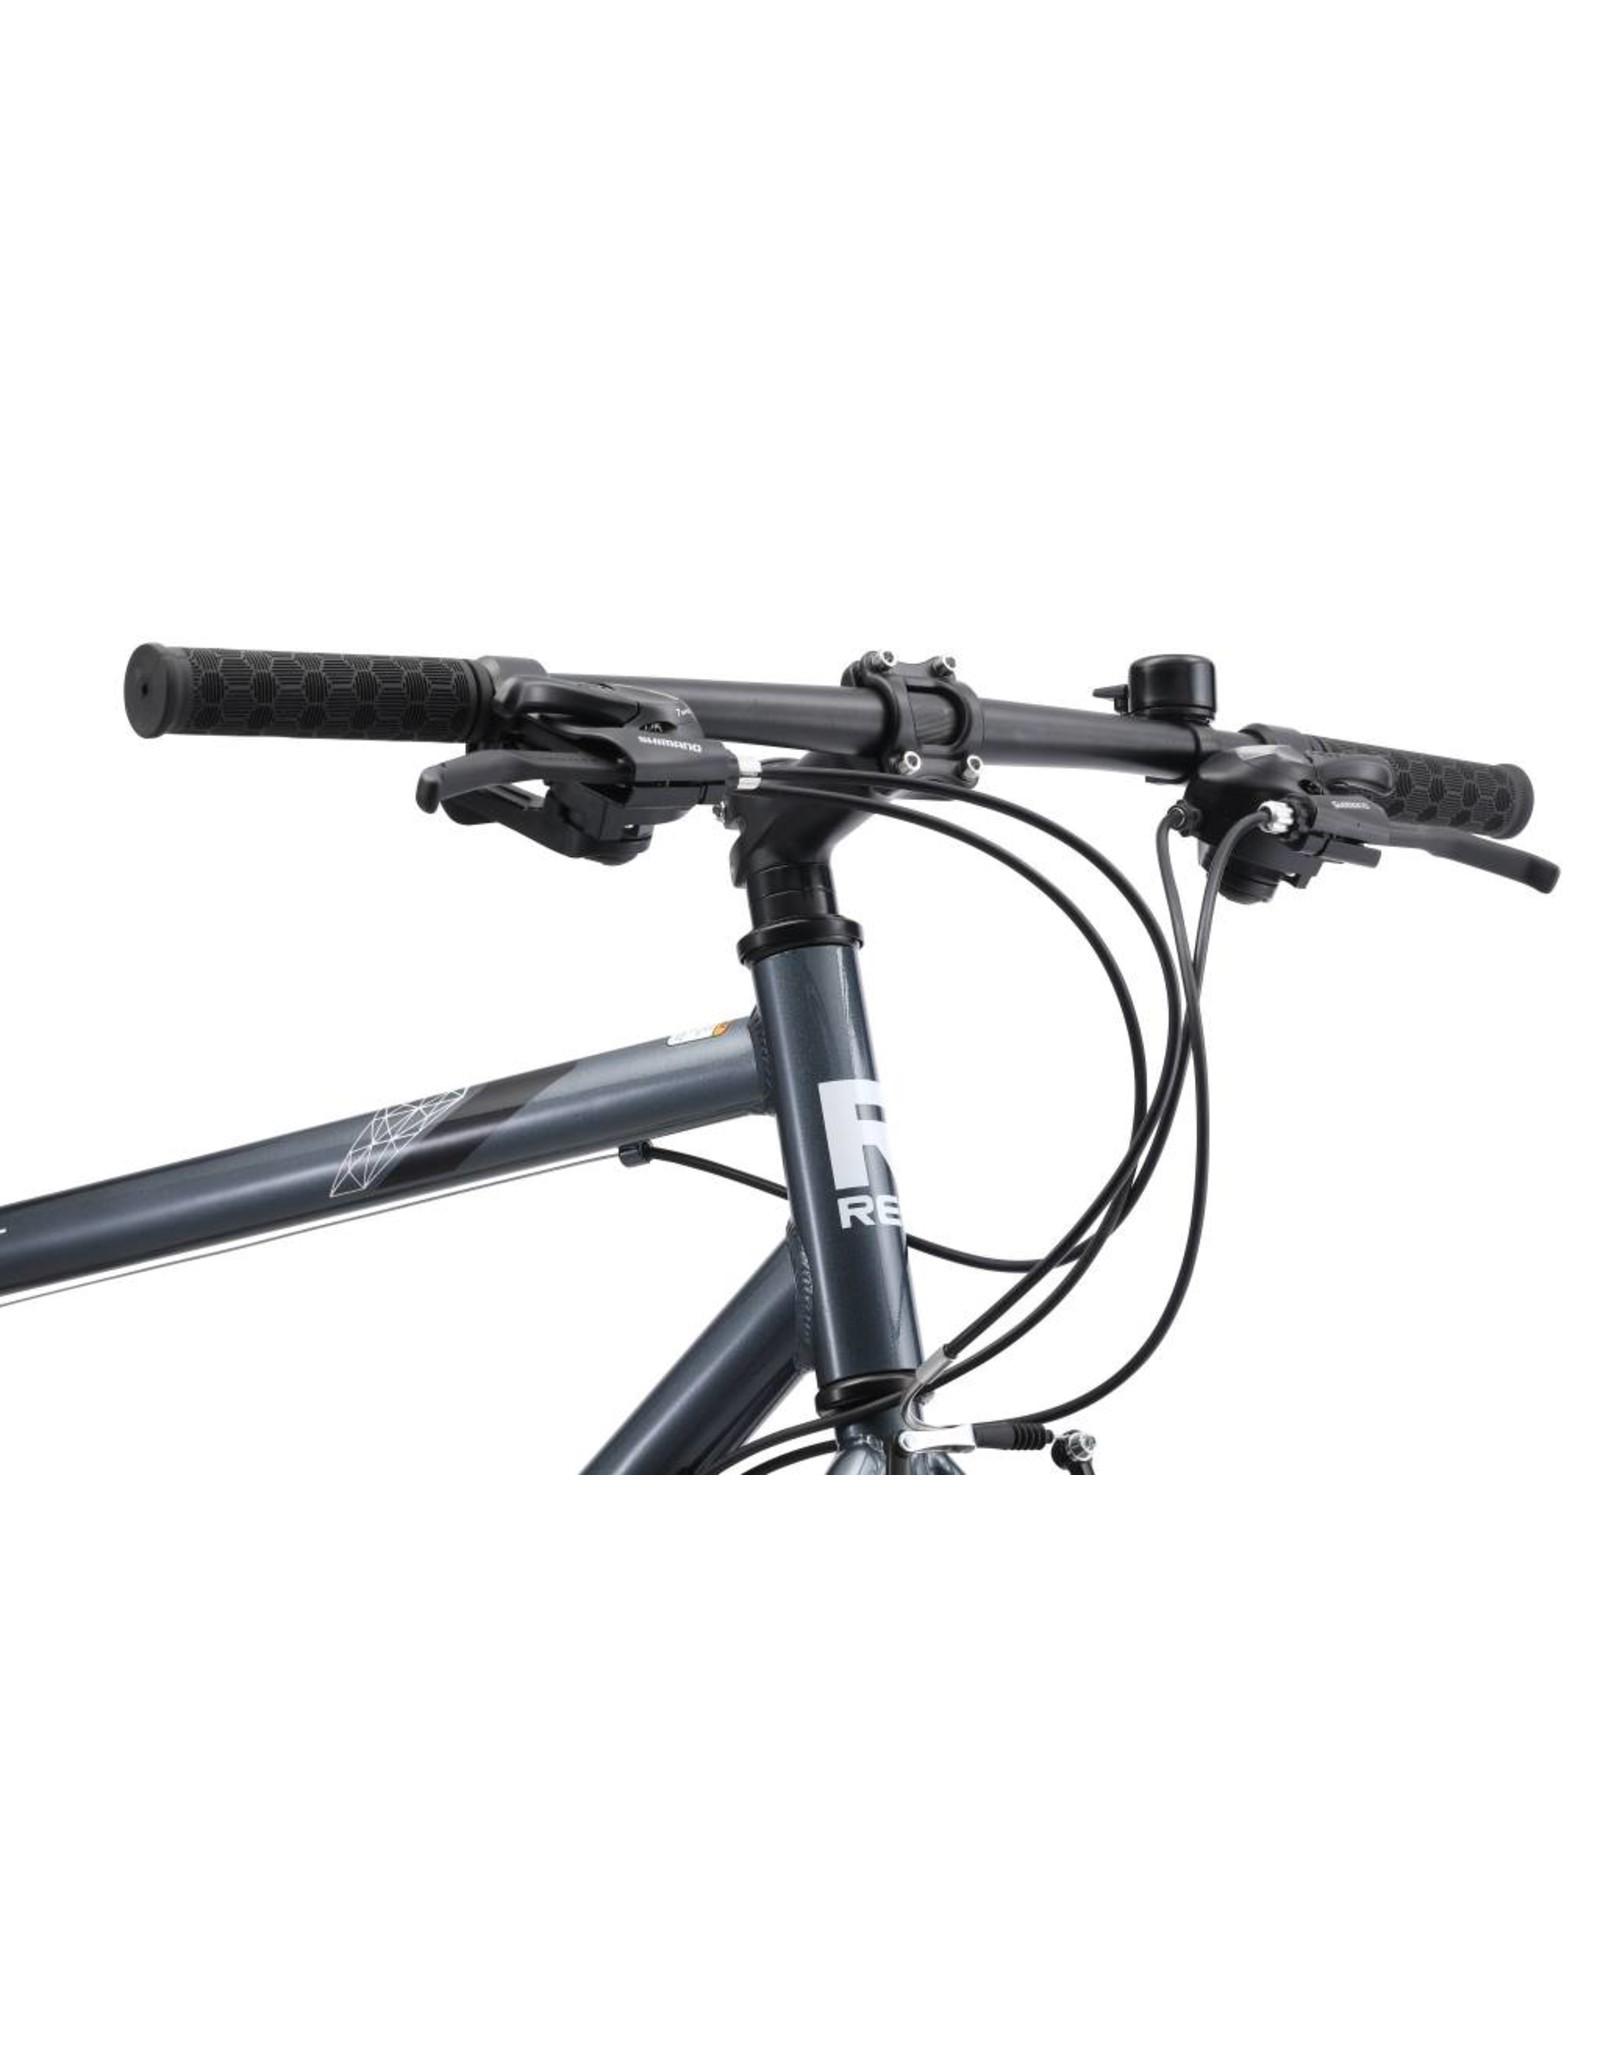 Reid Hybrid Bike - REID Transit H